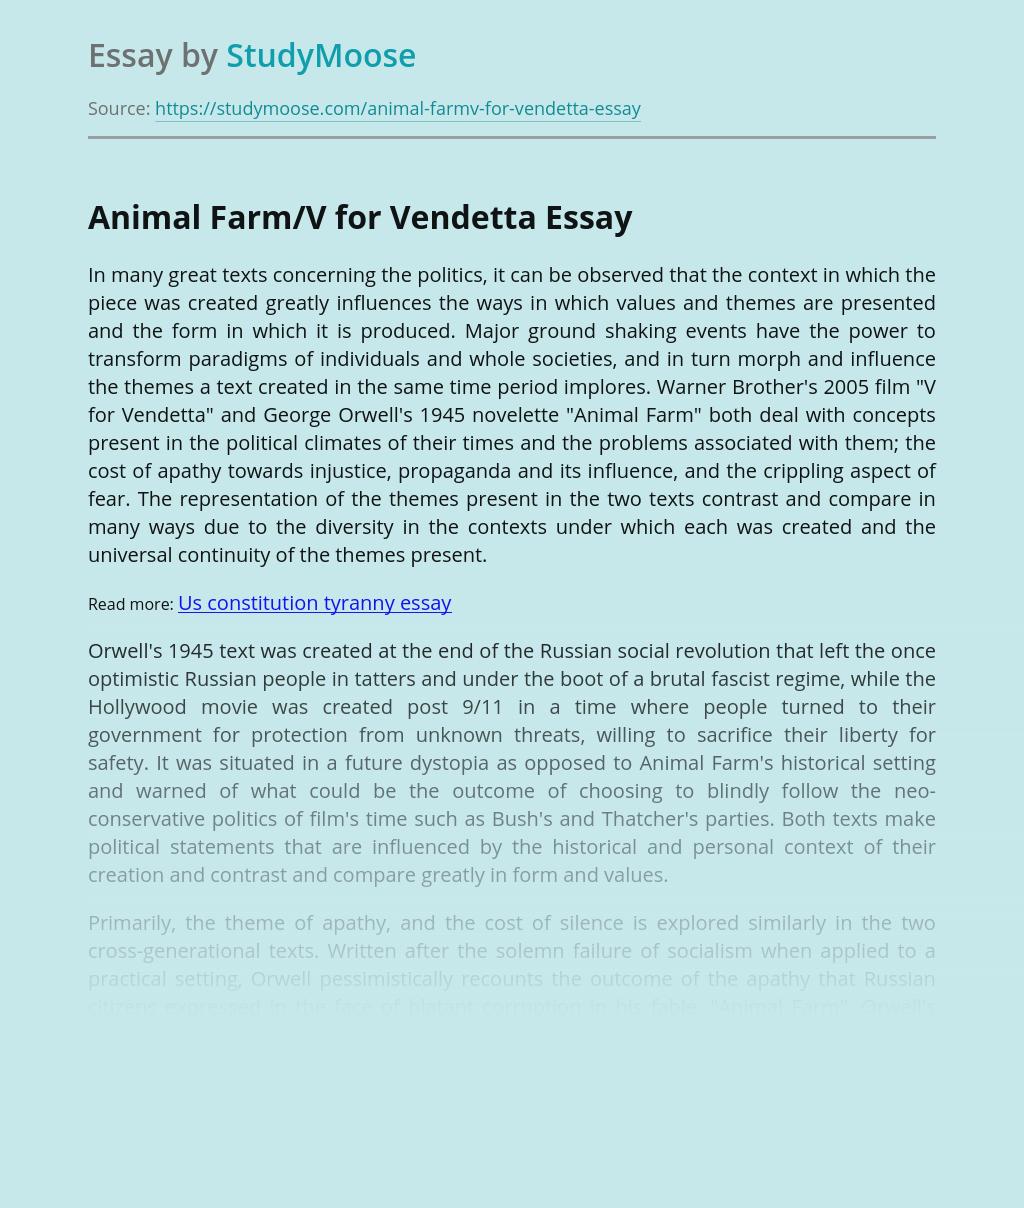 Animal Farm/V for Vendetta